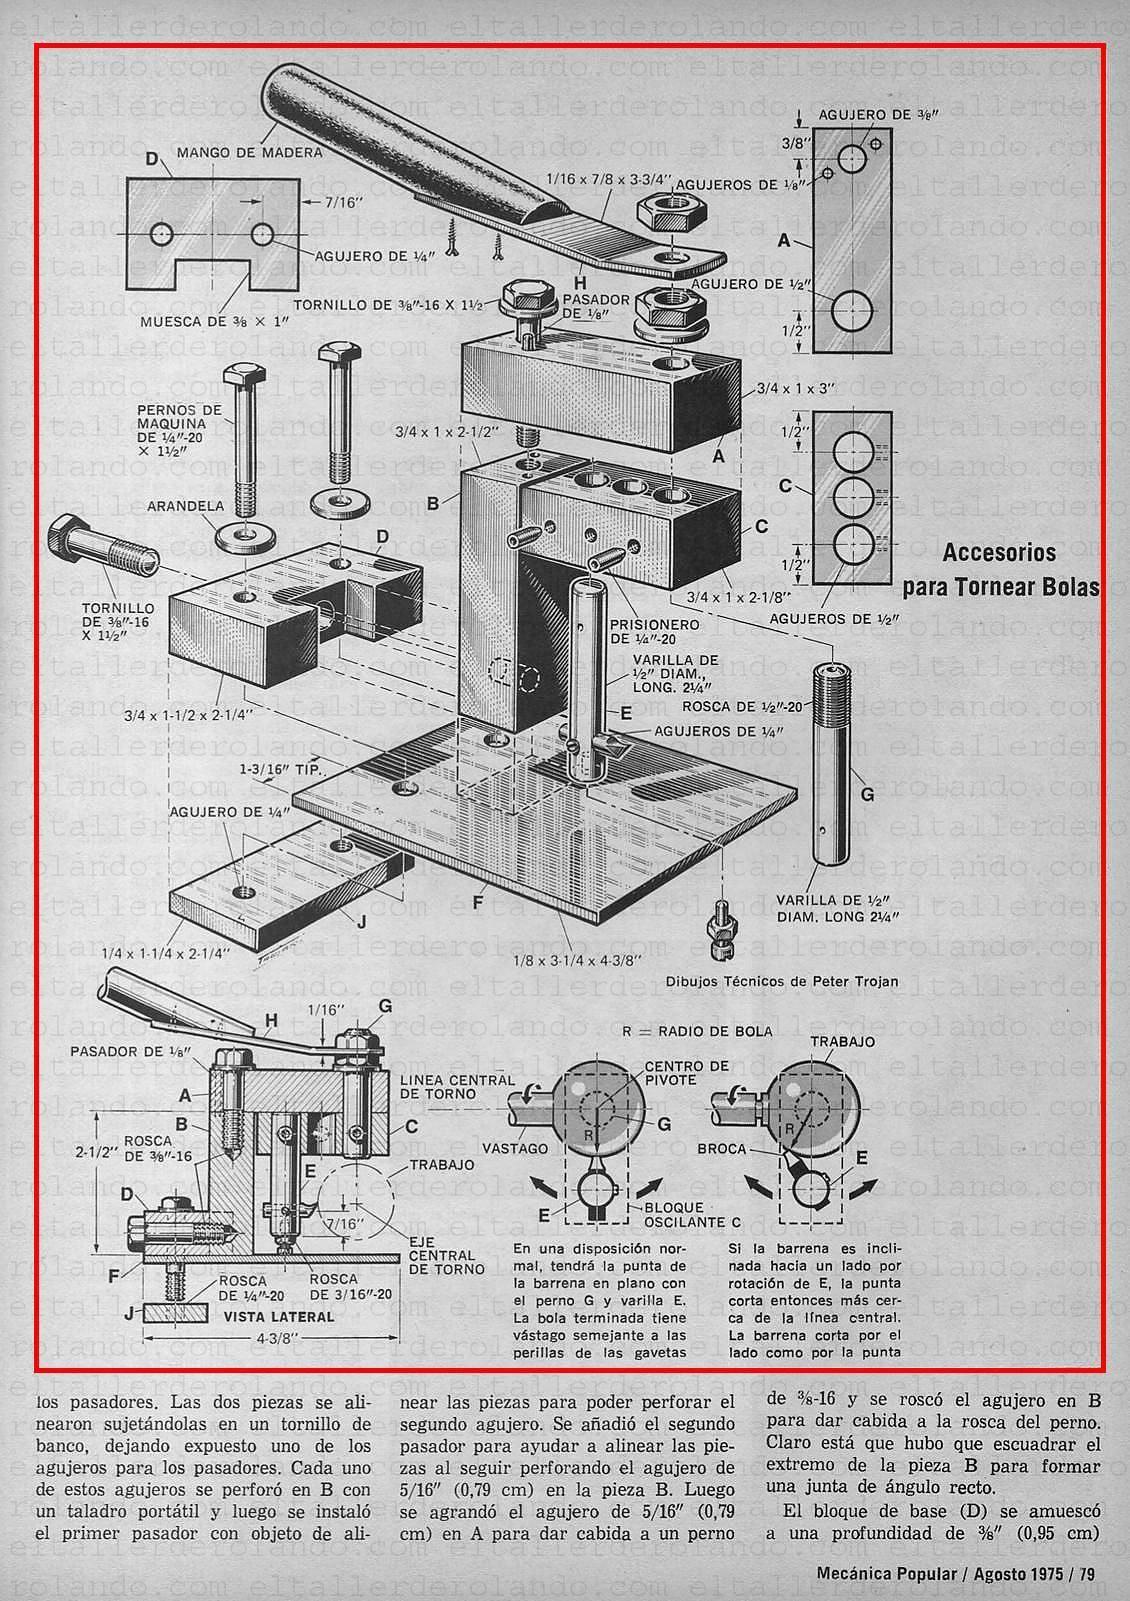 ACCESORIO DE TORNO PARA FORMAR CURVAS AGOSTO 1975 002A copia